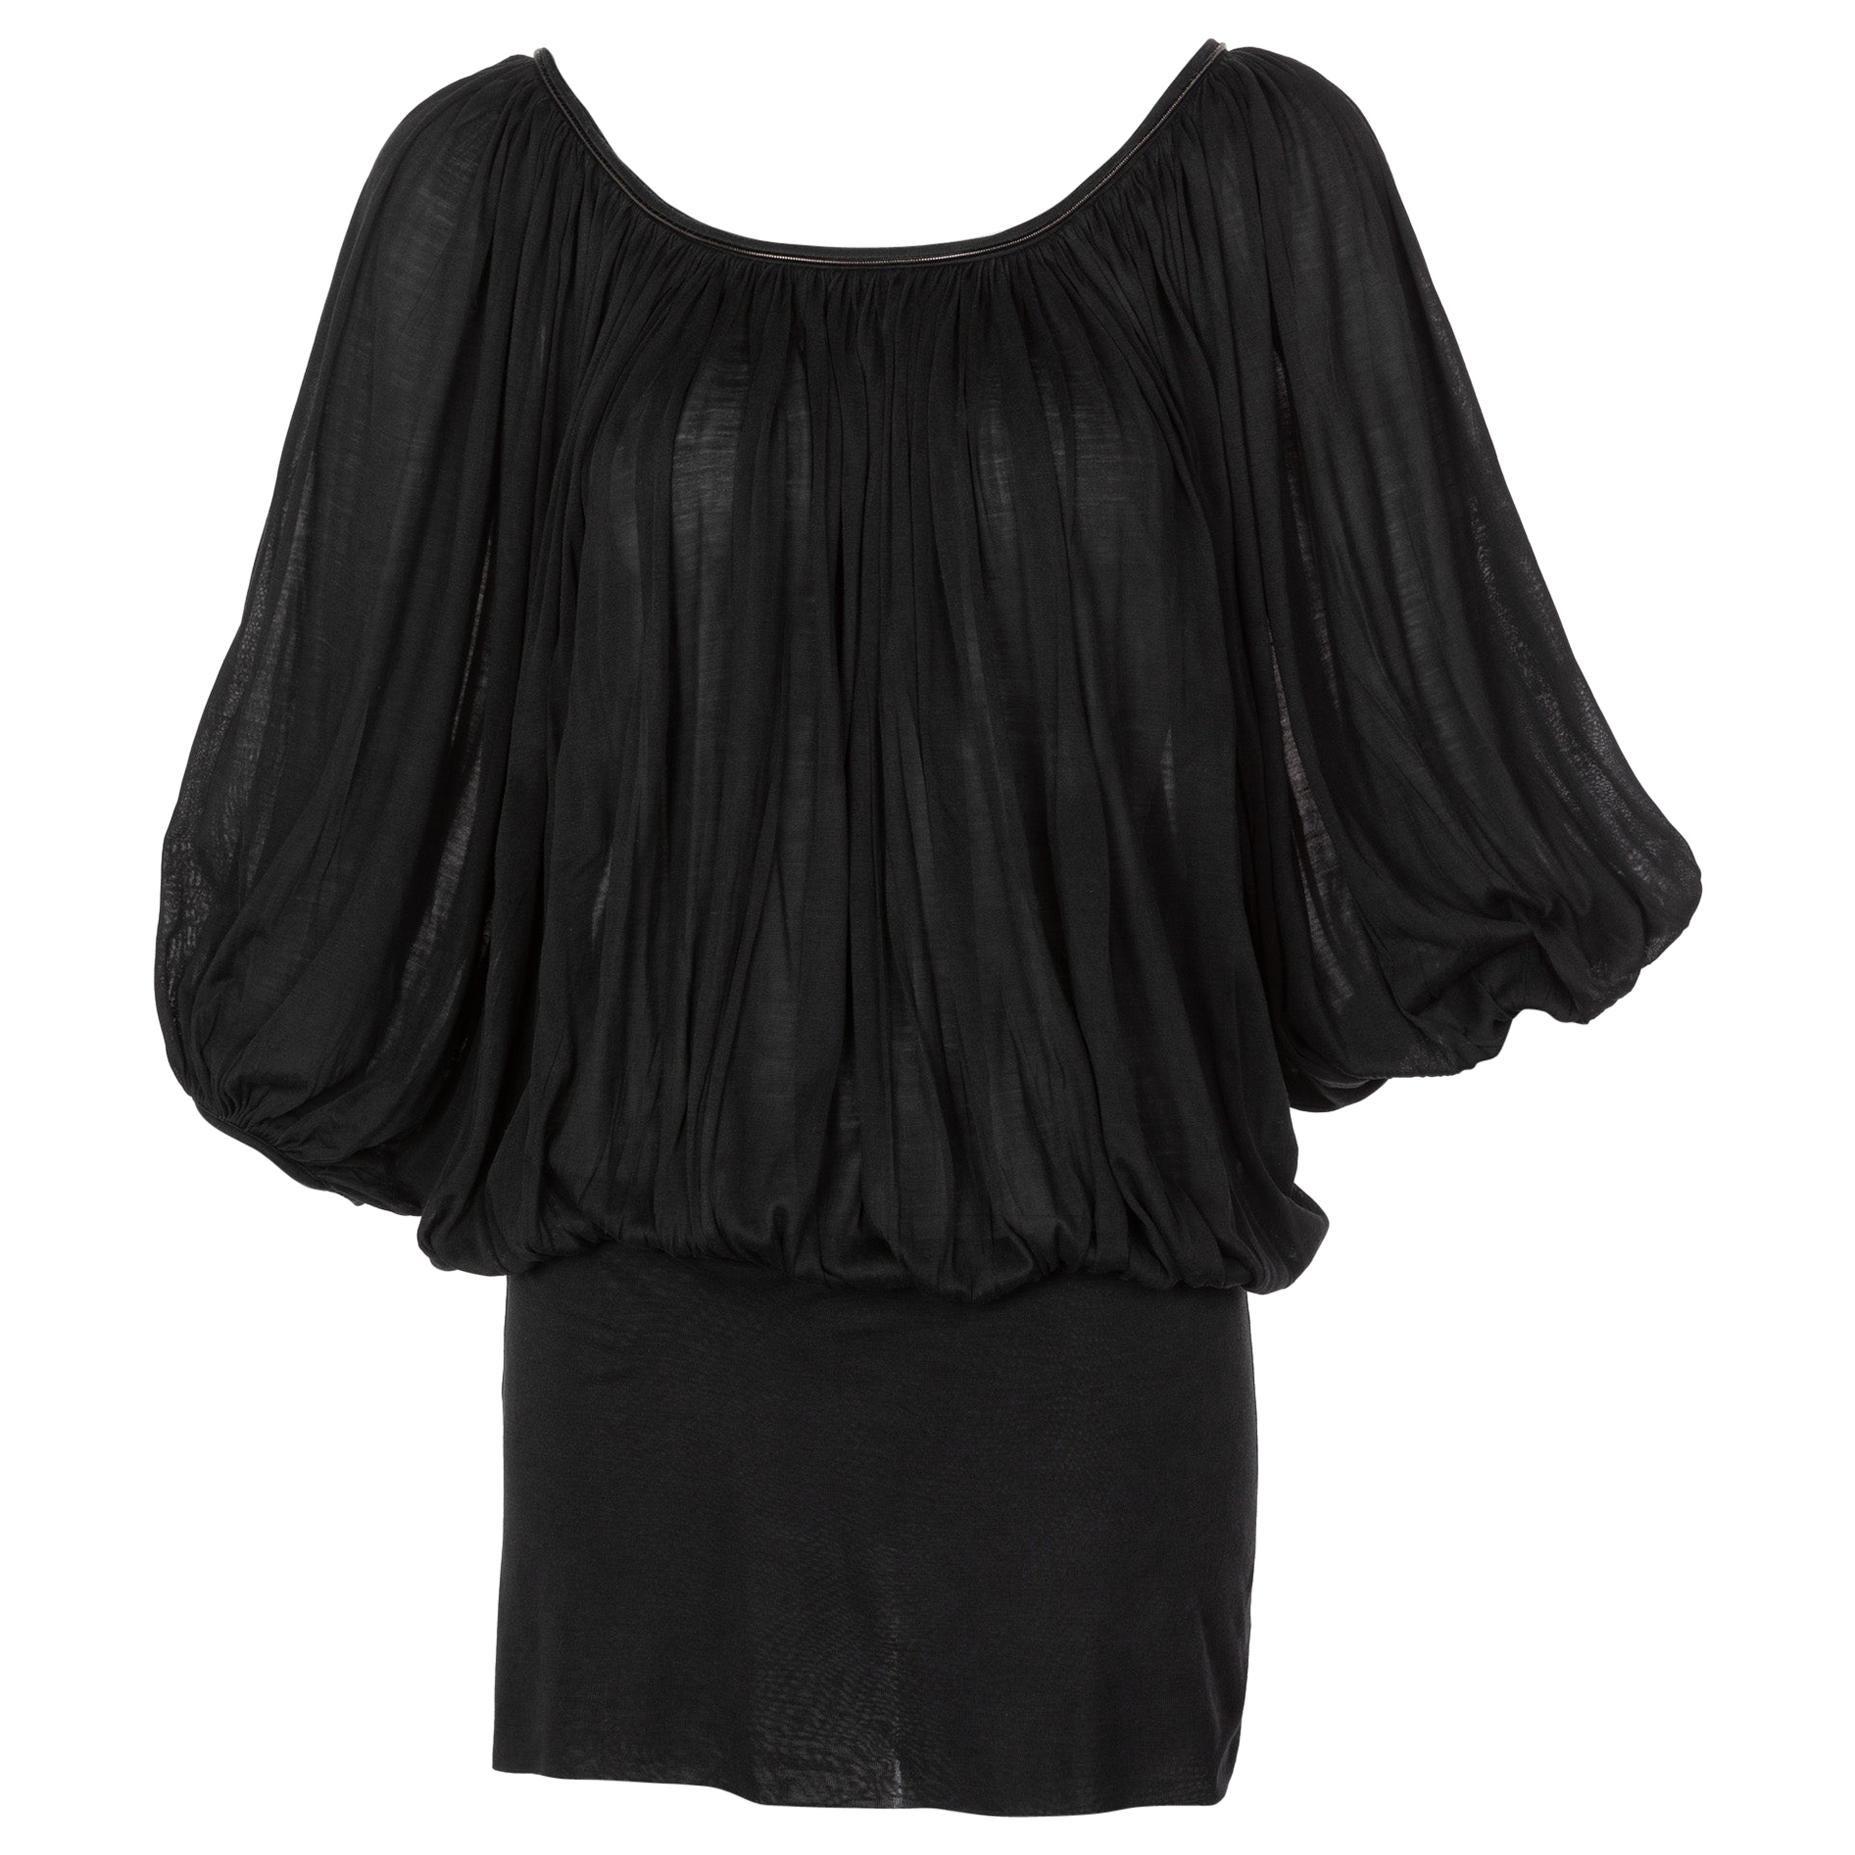 Neil Barrett Black Silk Metal Detail Silk Blouse Tunic Top, 2015